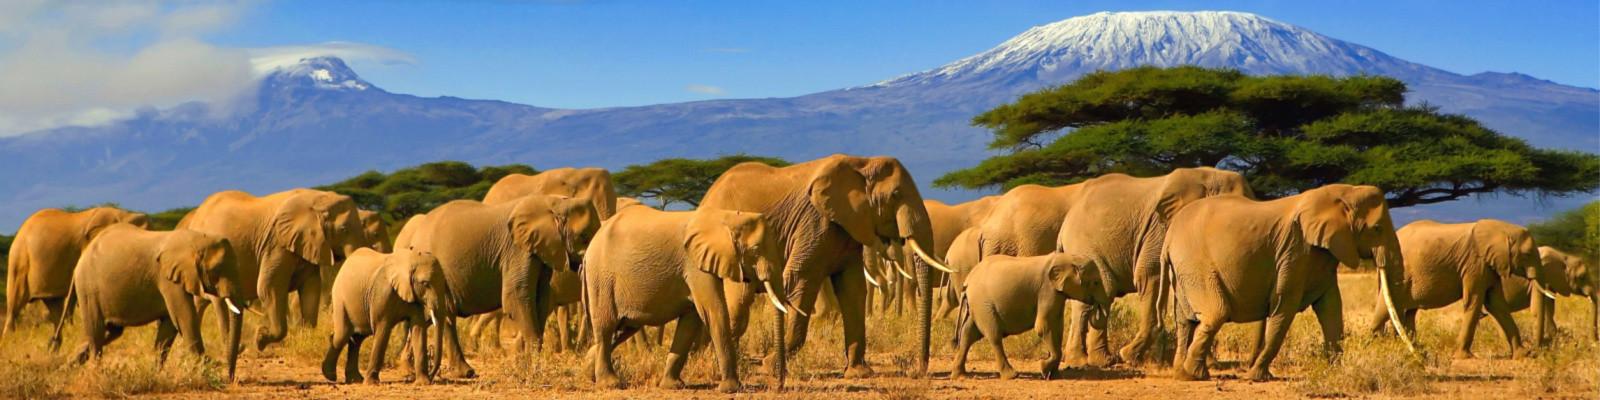 Löwe auf Safari Reisen